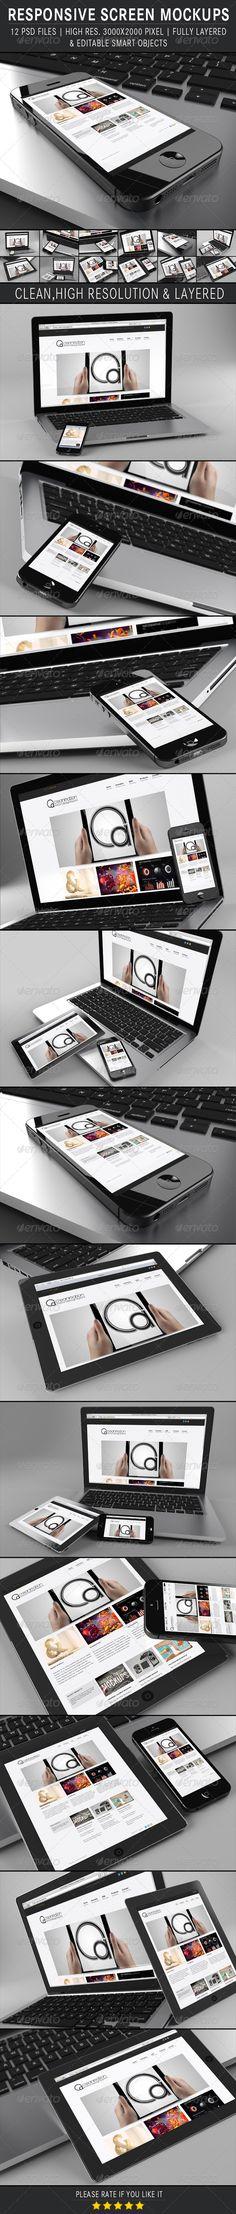 Responsive Screen Mockups. This Pack includes 12 PSD mock-ups ideal for web design showcase, application design, UI/UX design or just Image presentation.